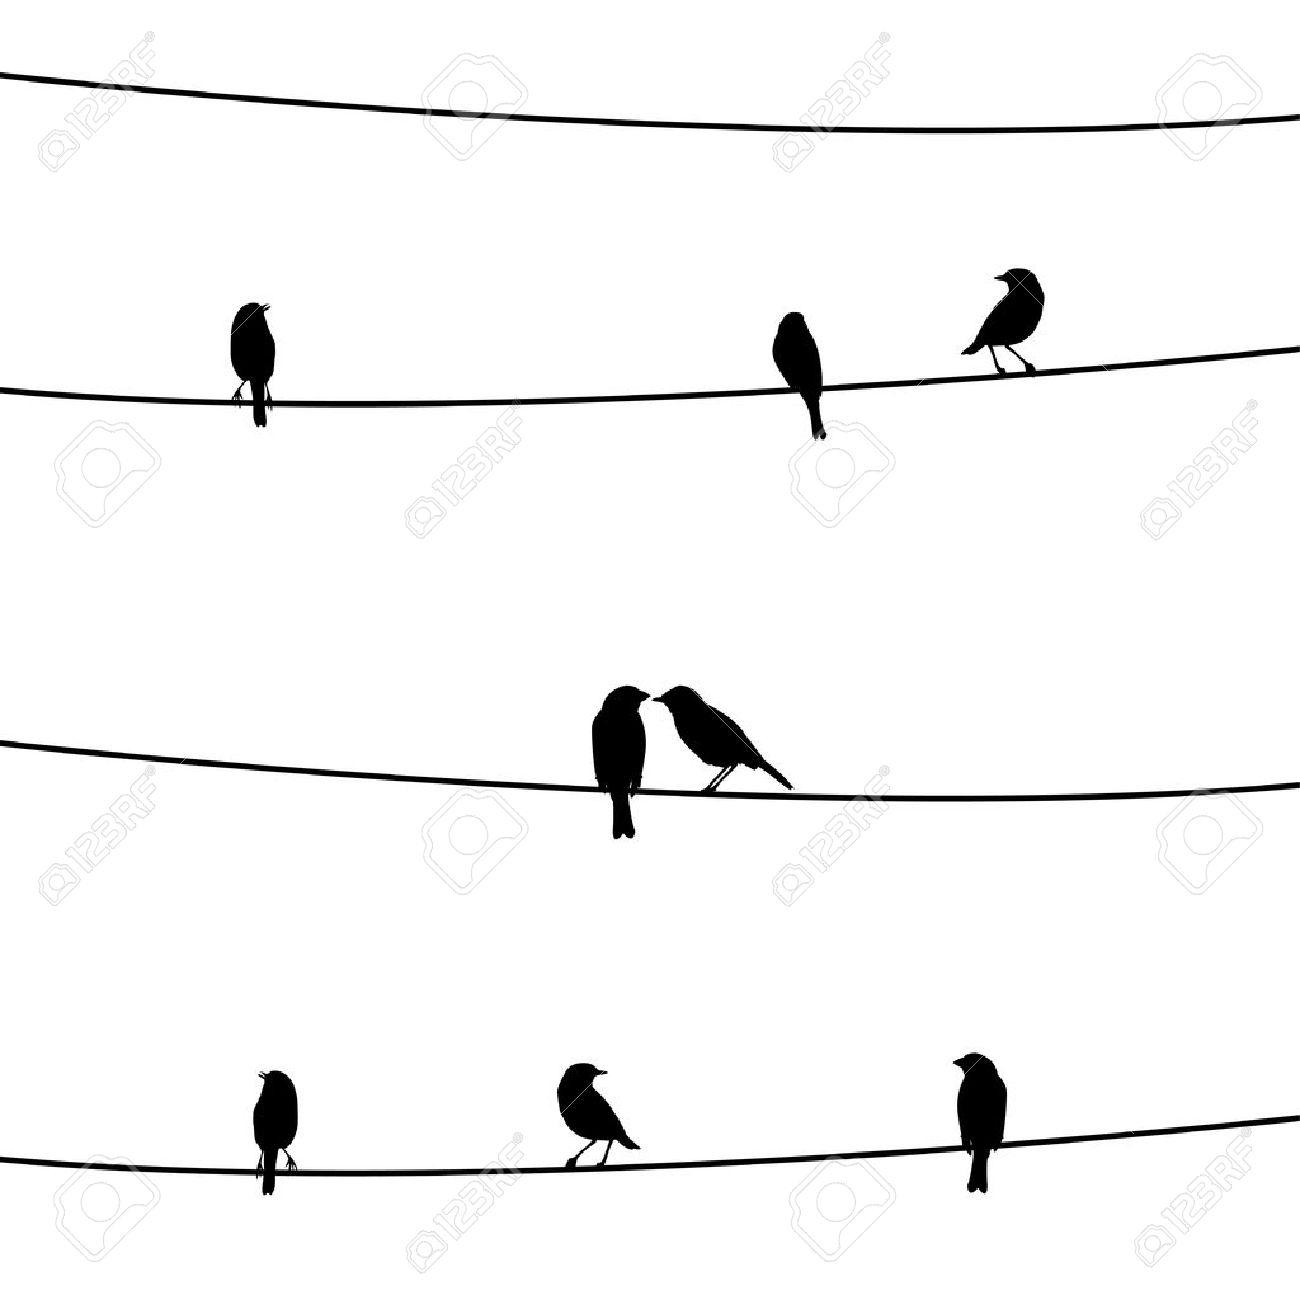 Vögel Auf Dem Draht Lizenzfrei Nutzbare Vektorgrafiken, Clip Arts ...